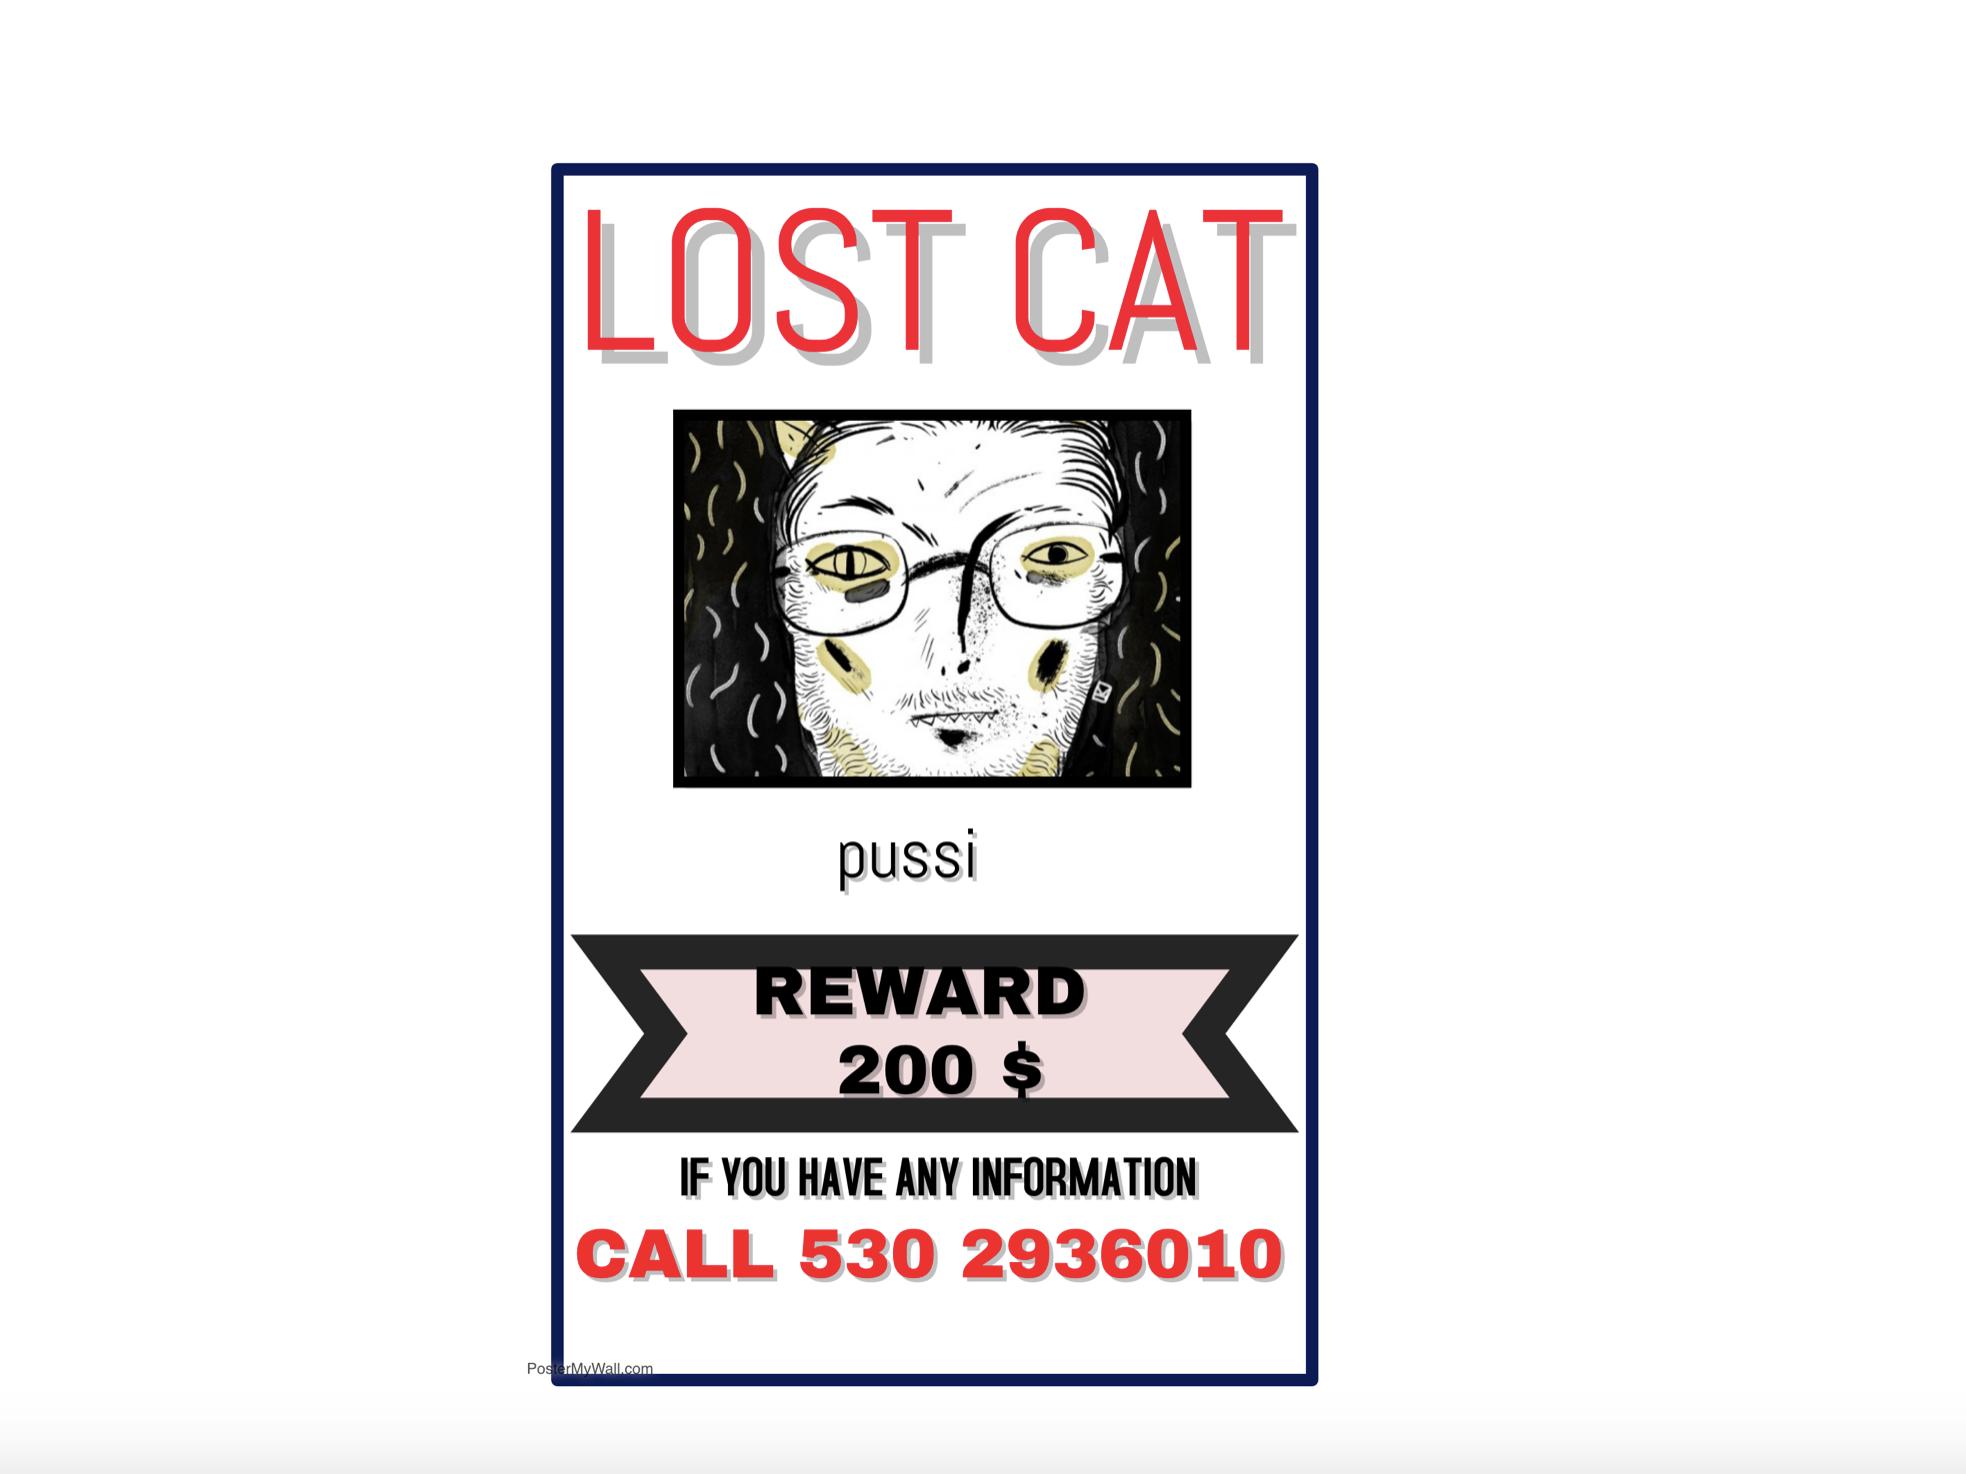 LOST CAT : PLEASE CALL